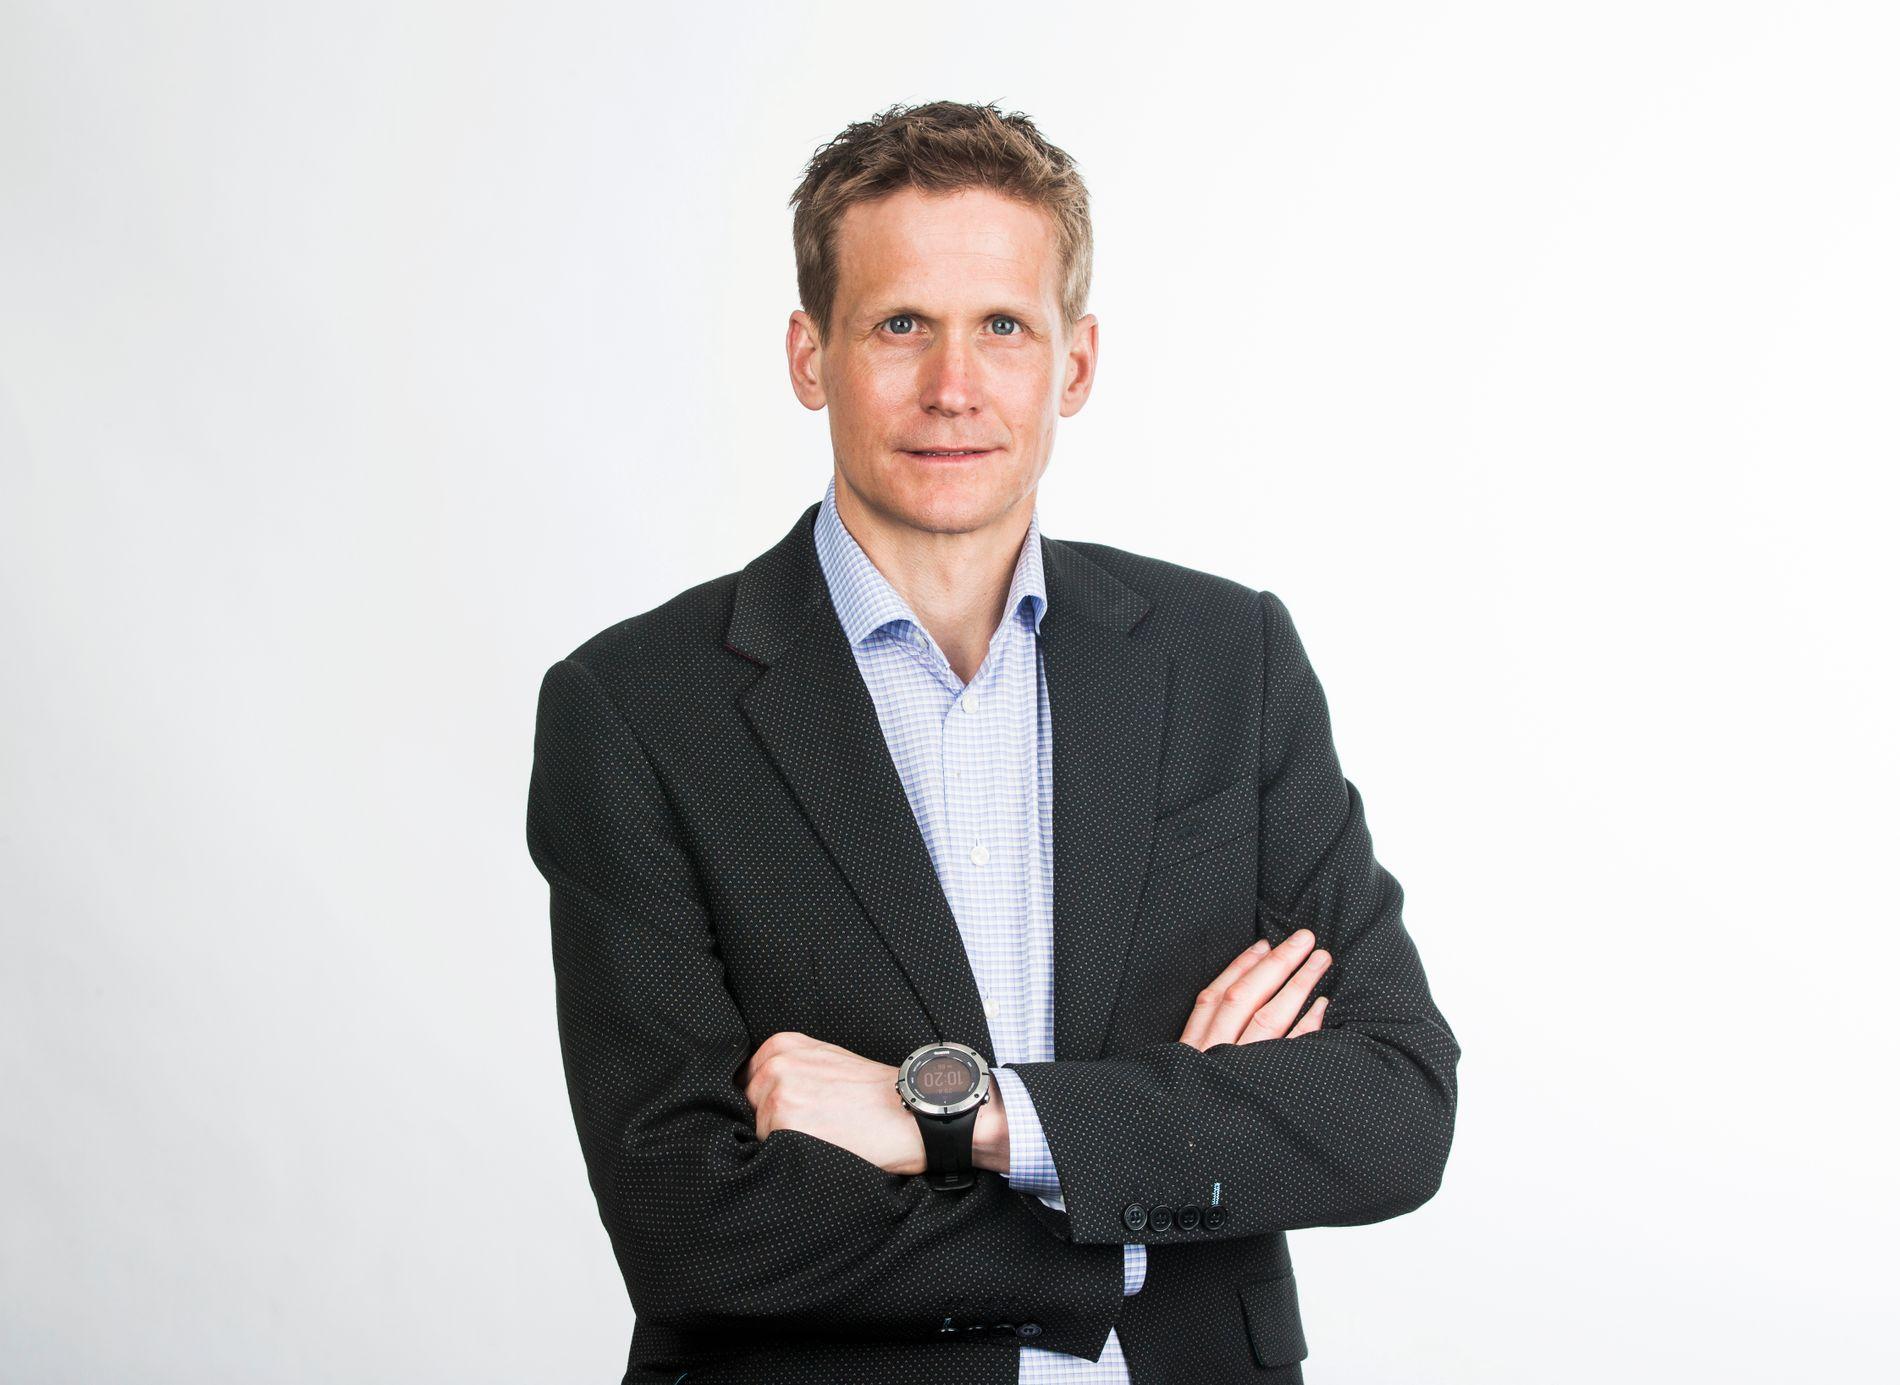 VGs sportskommentator Leif Welhaven.